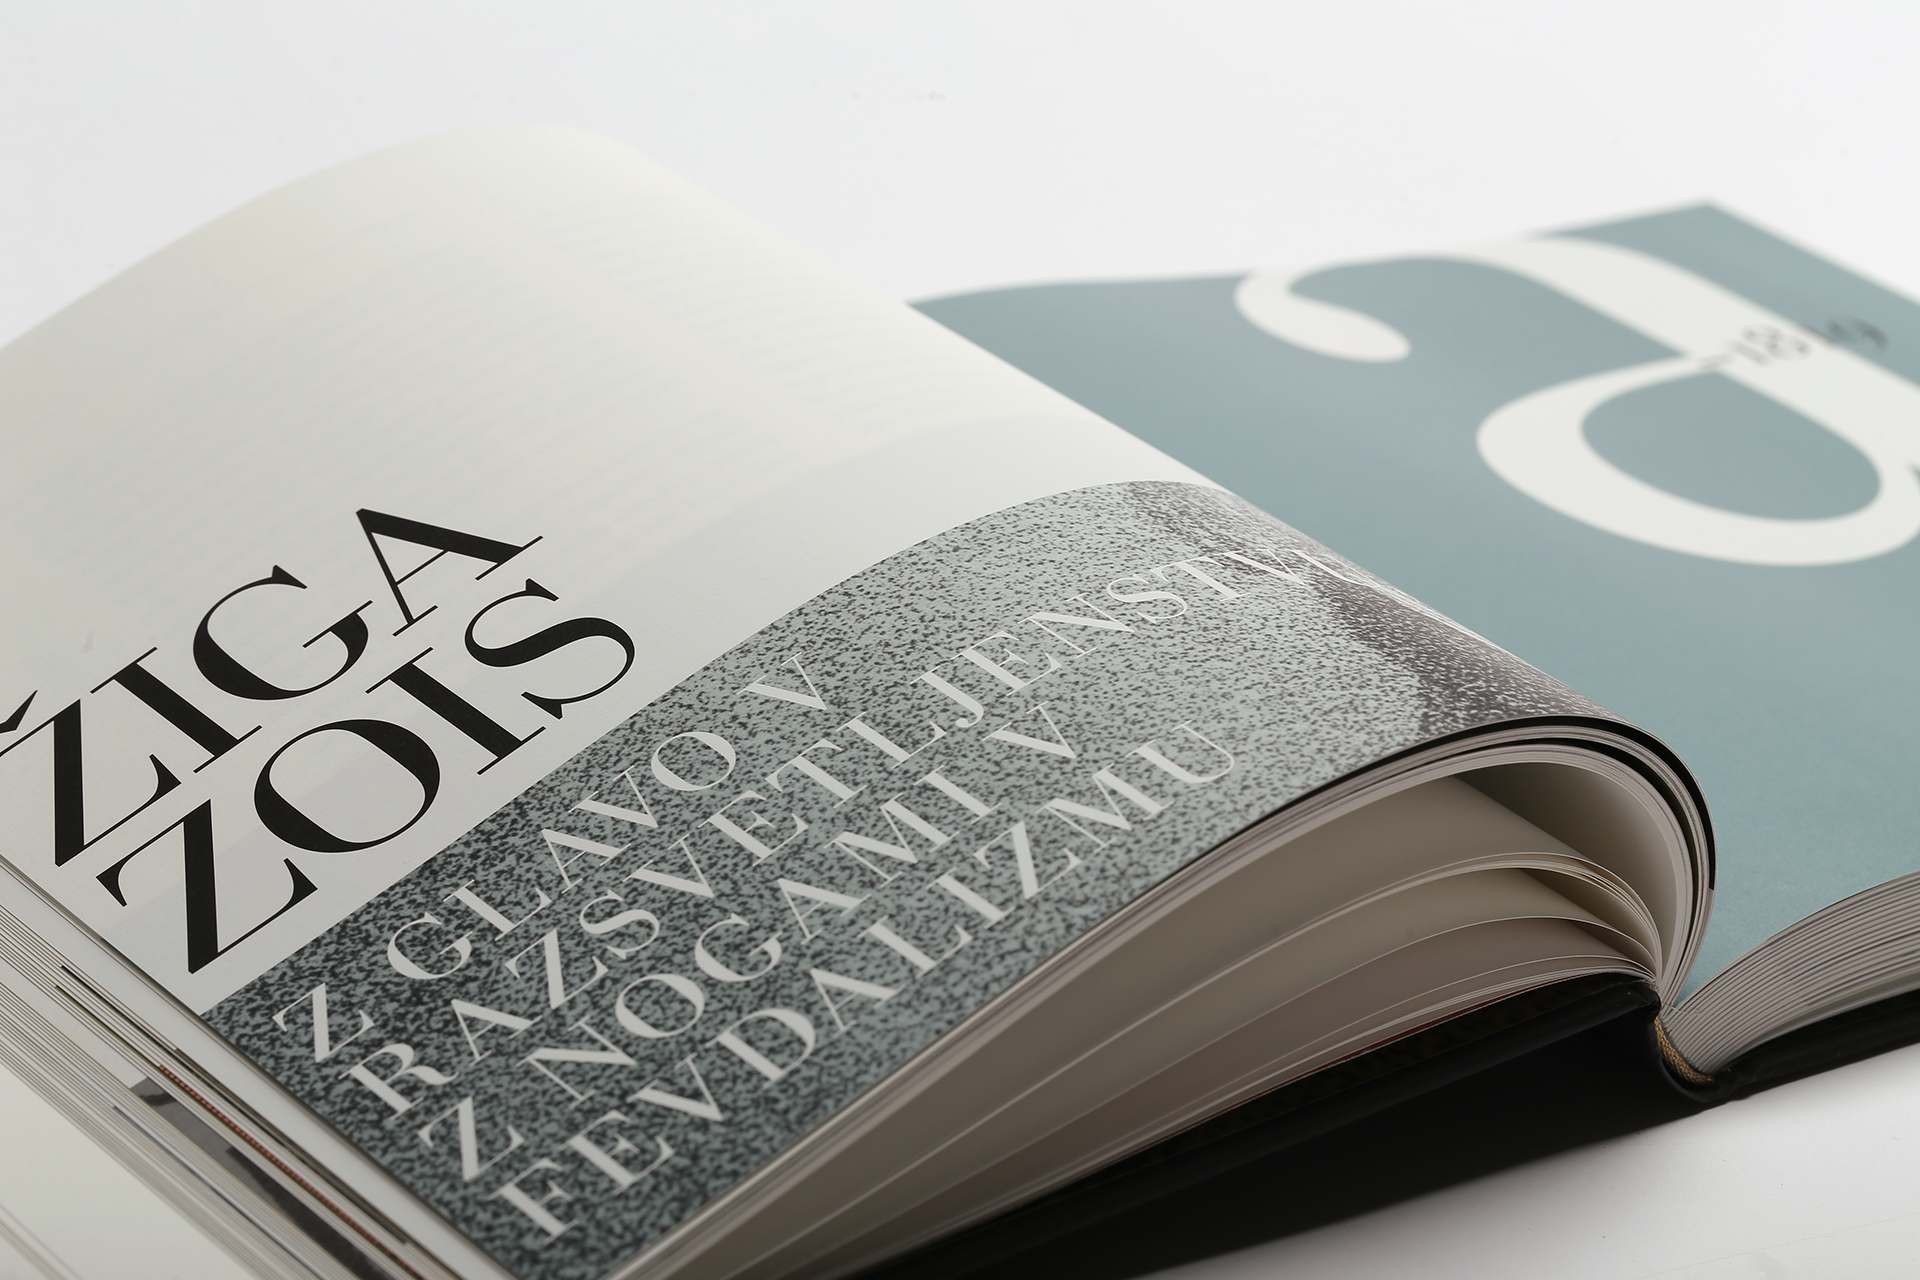 knjiga_stebri_slov_gospodarstva_ma-ma_marko_marinsek_17_6